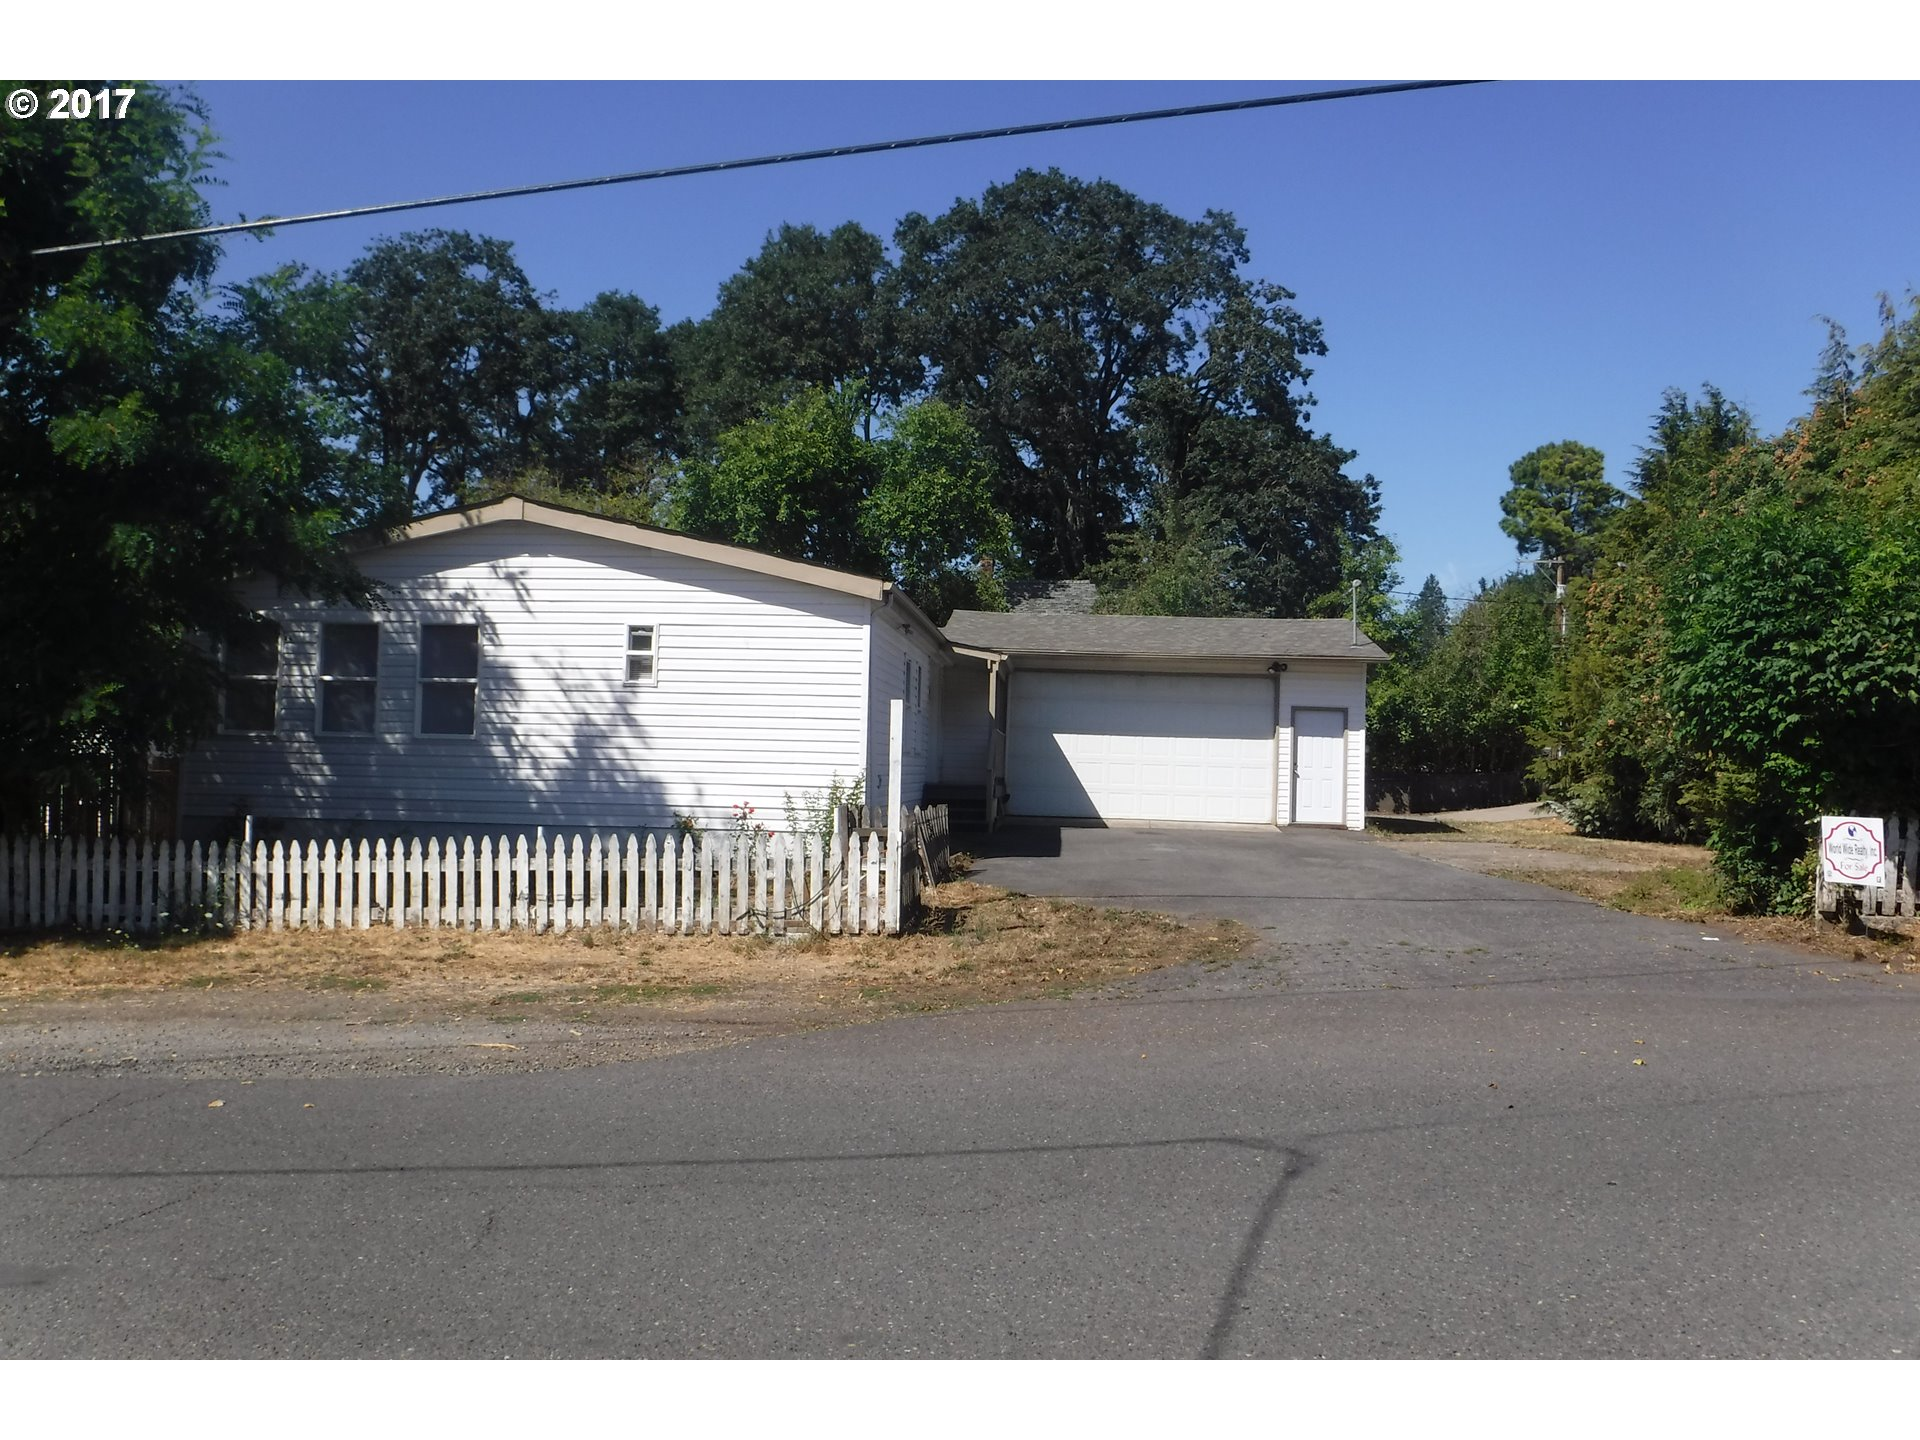 13865 MELINDA ST, Oregon City, OR 97045